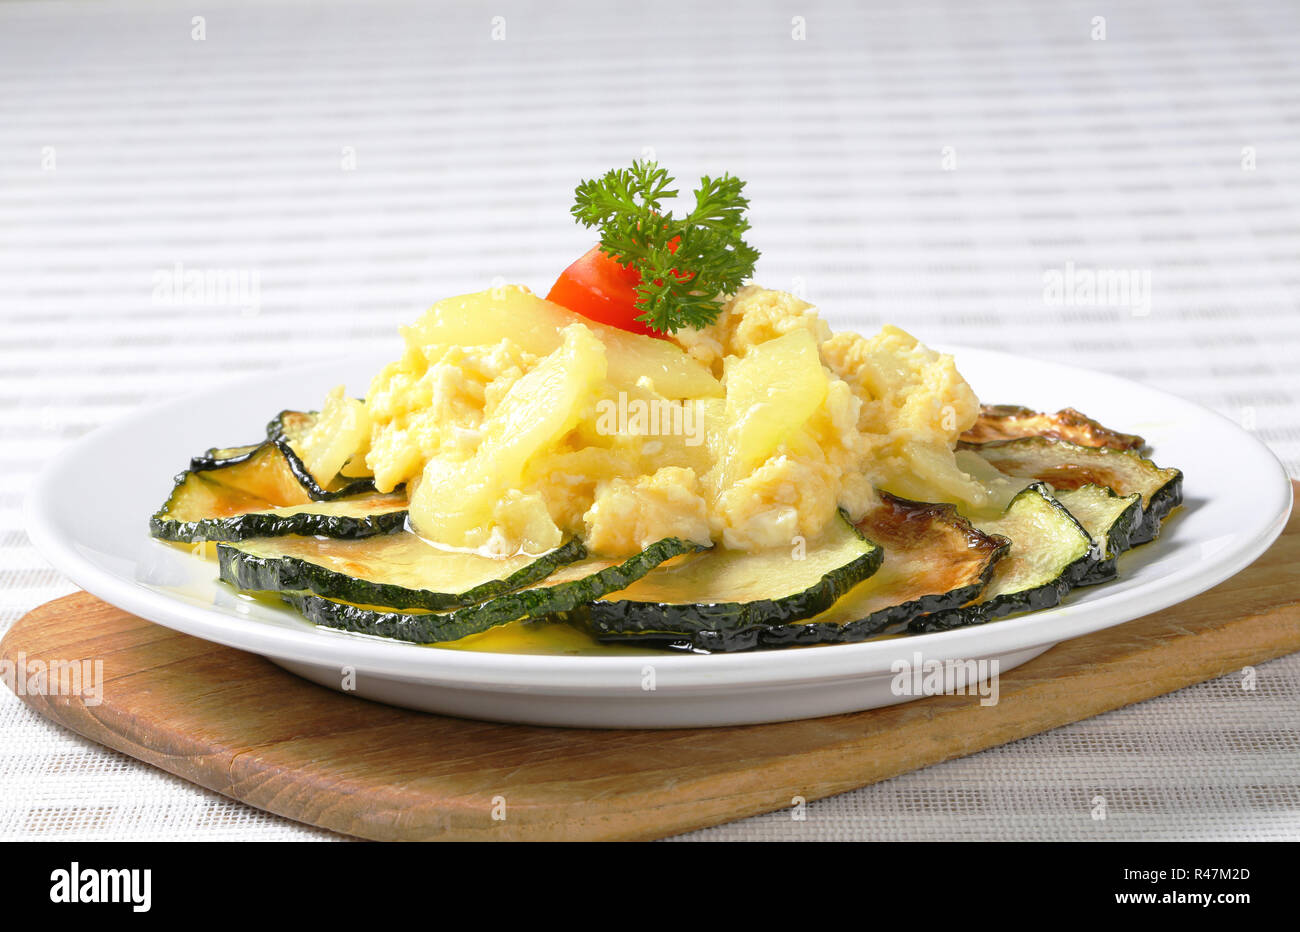 Roasted zucchini with potato egg scramble - Stock Image